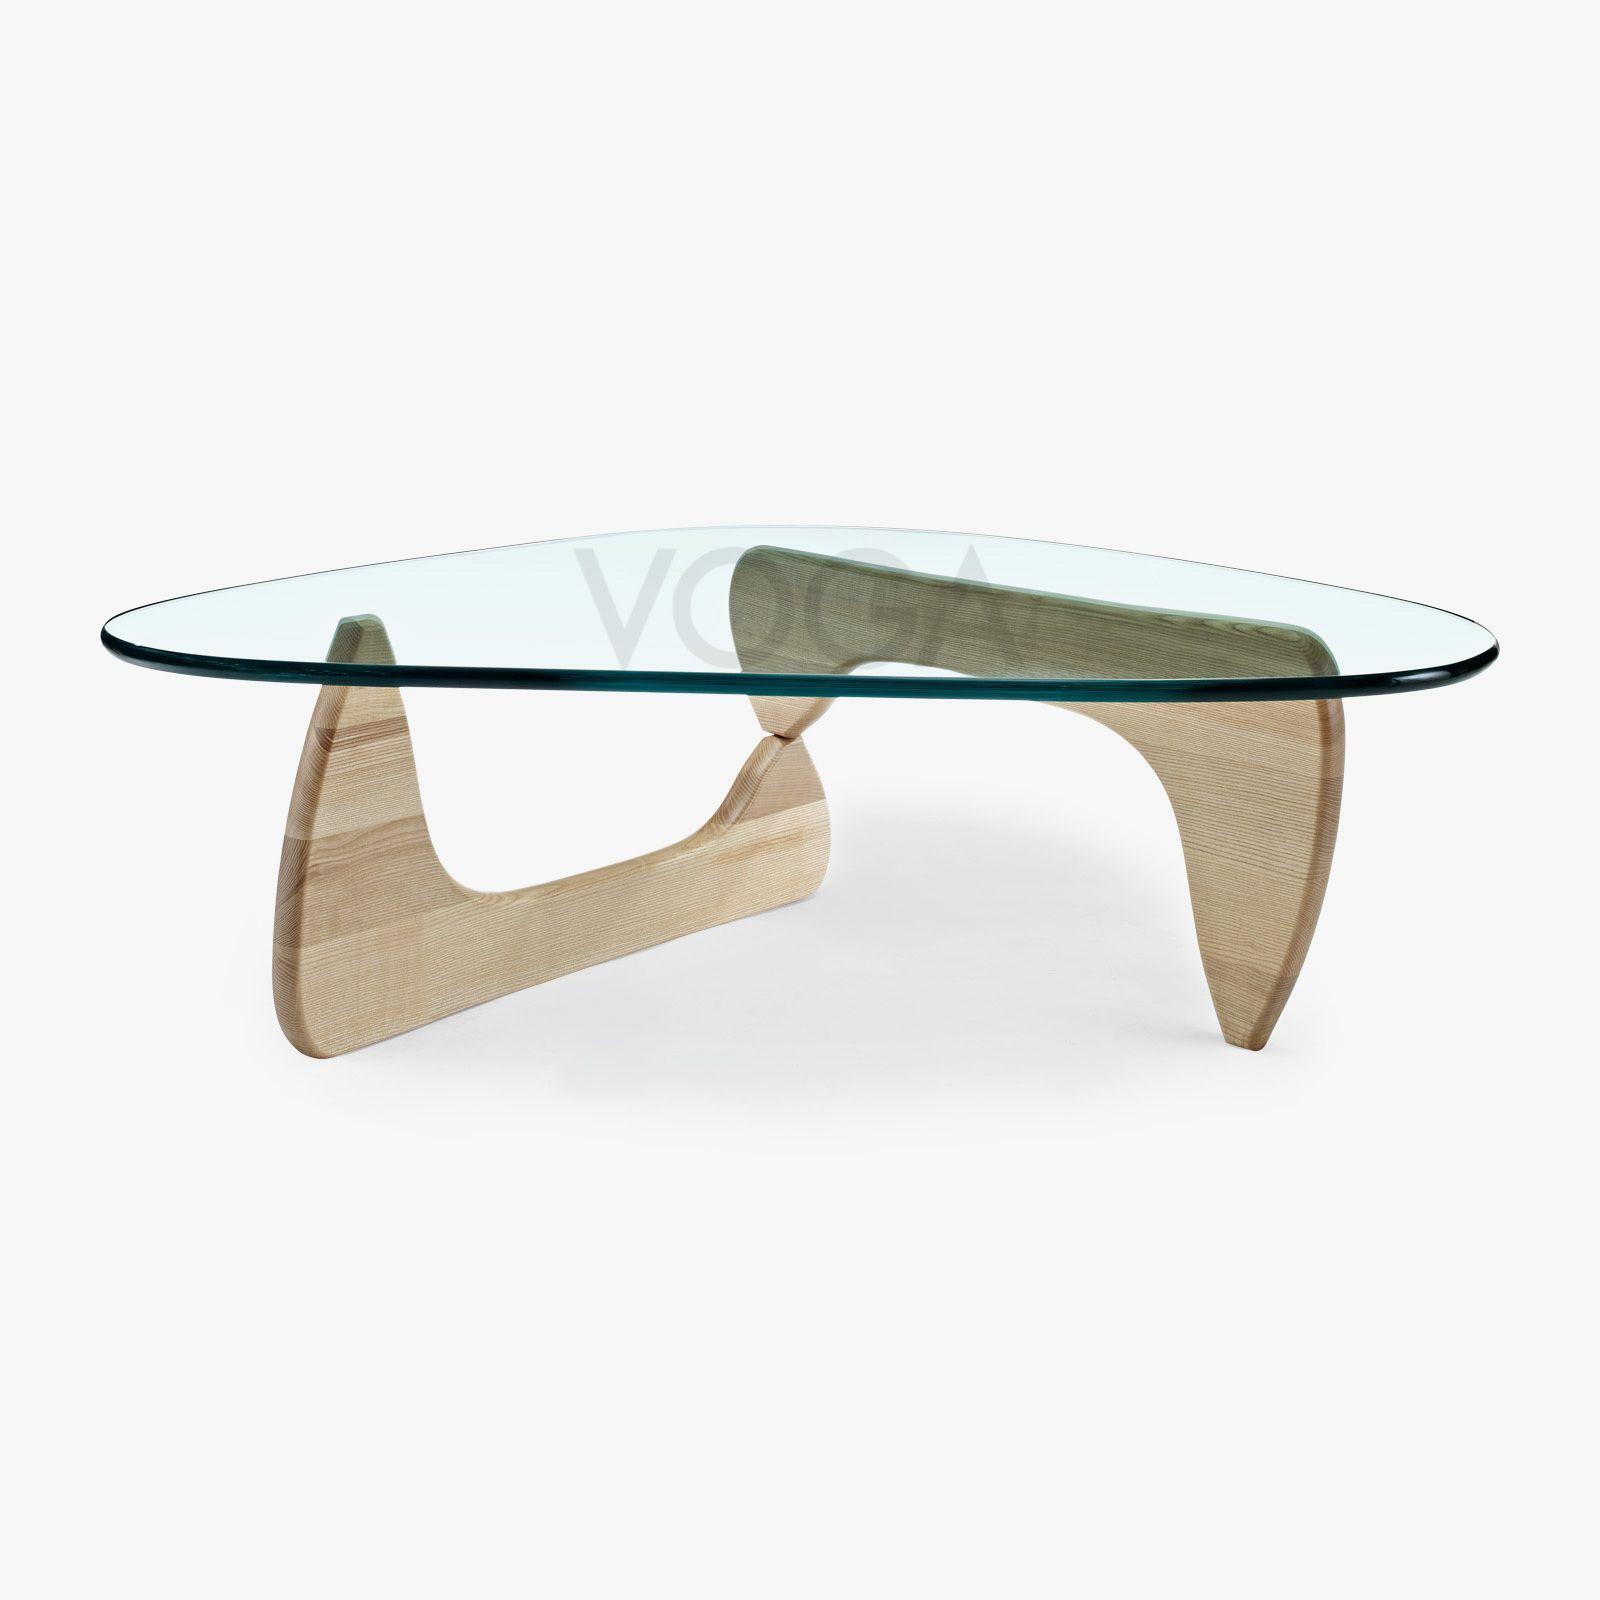 The Isamu Noguchi coffee table is available at VOGA Villa Benjamin